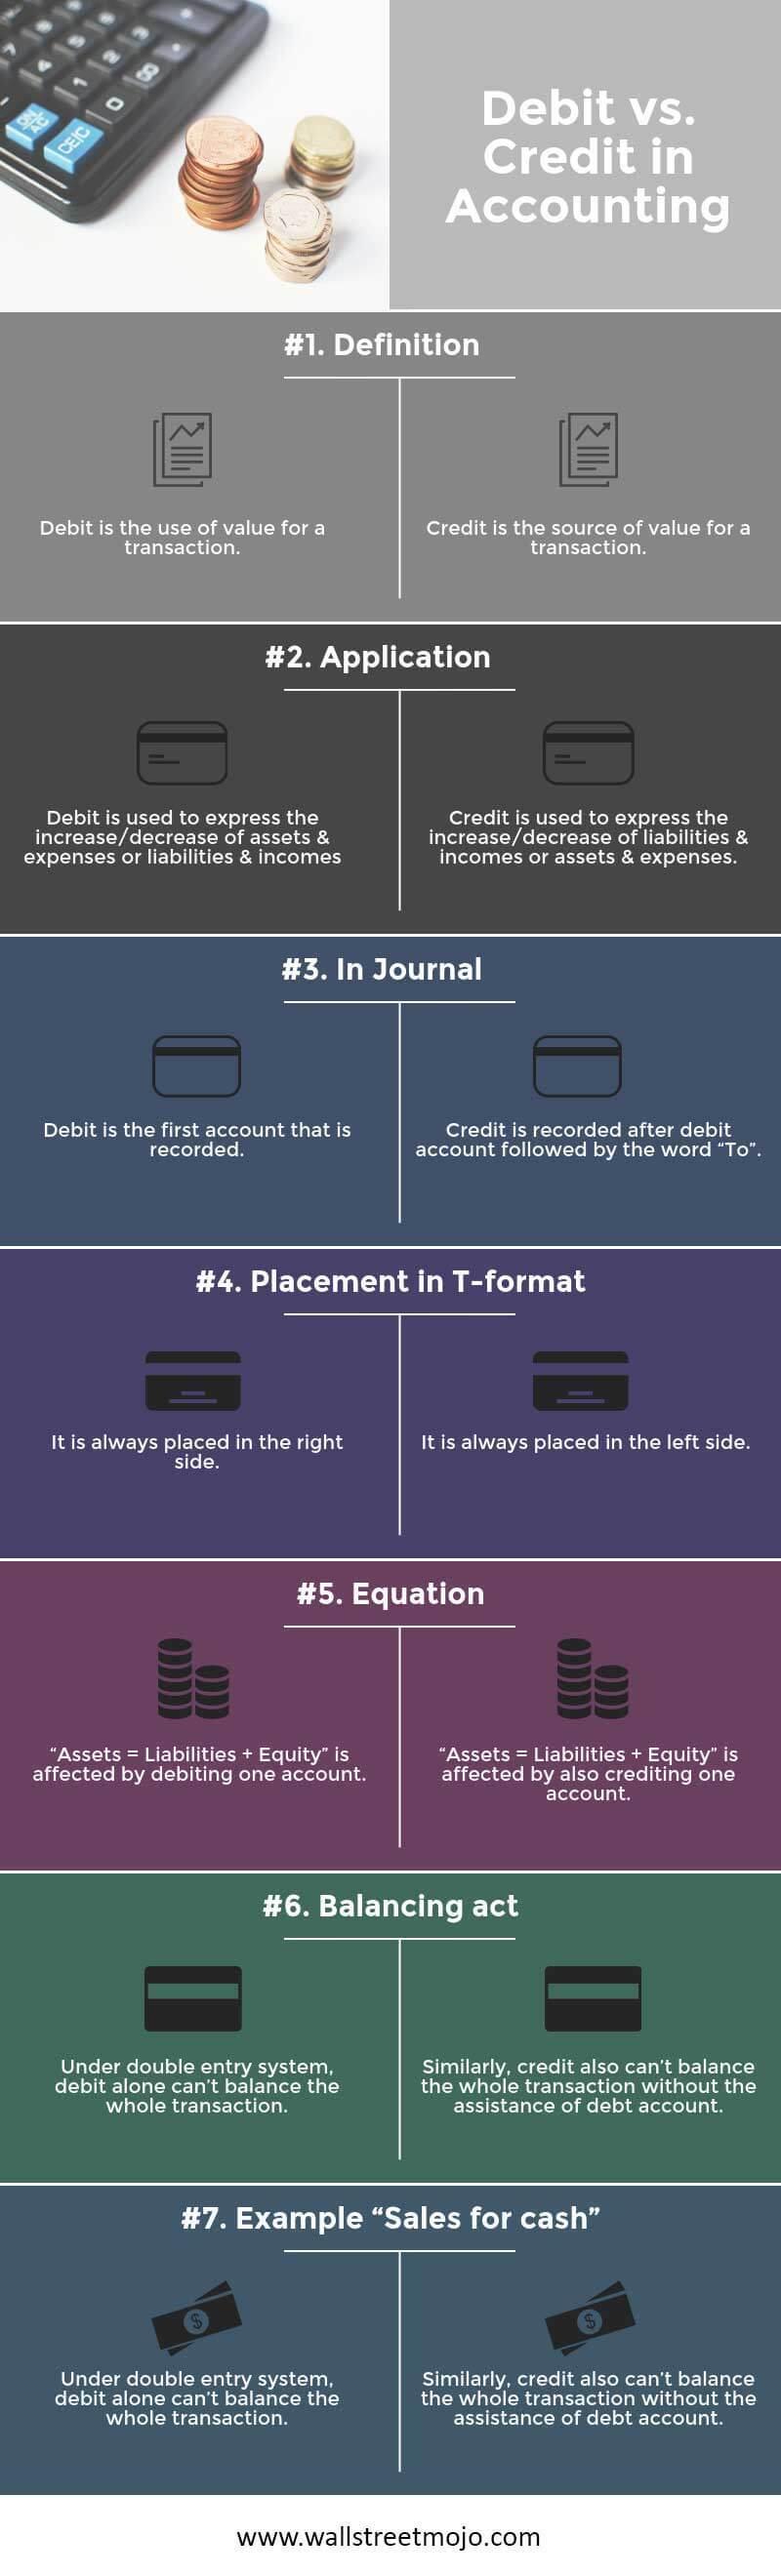 Debit vs Credit in Accounting